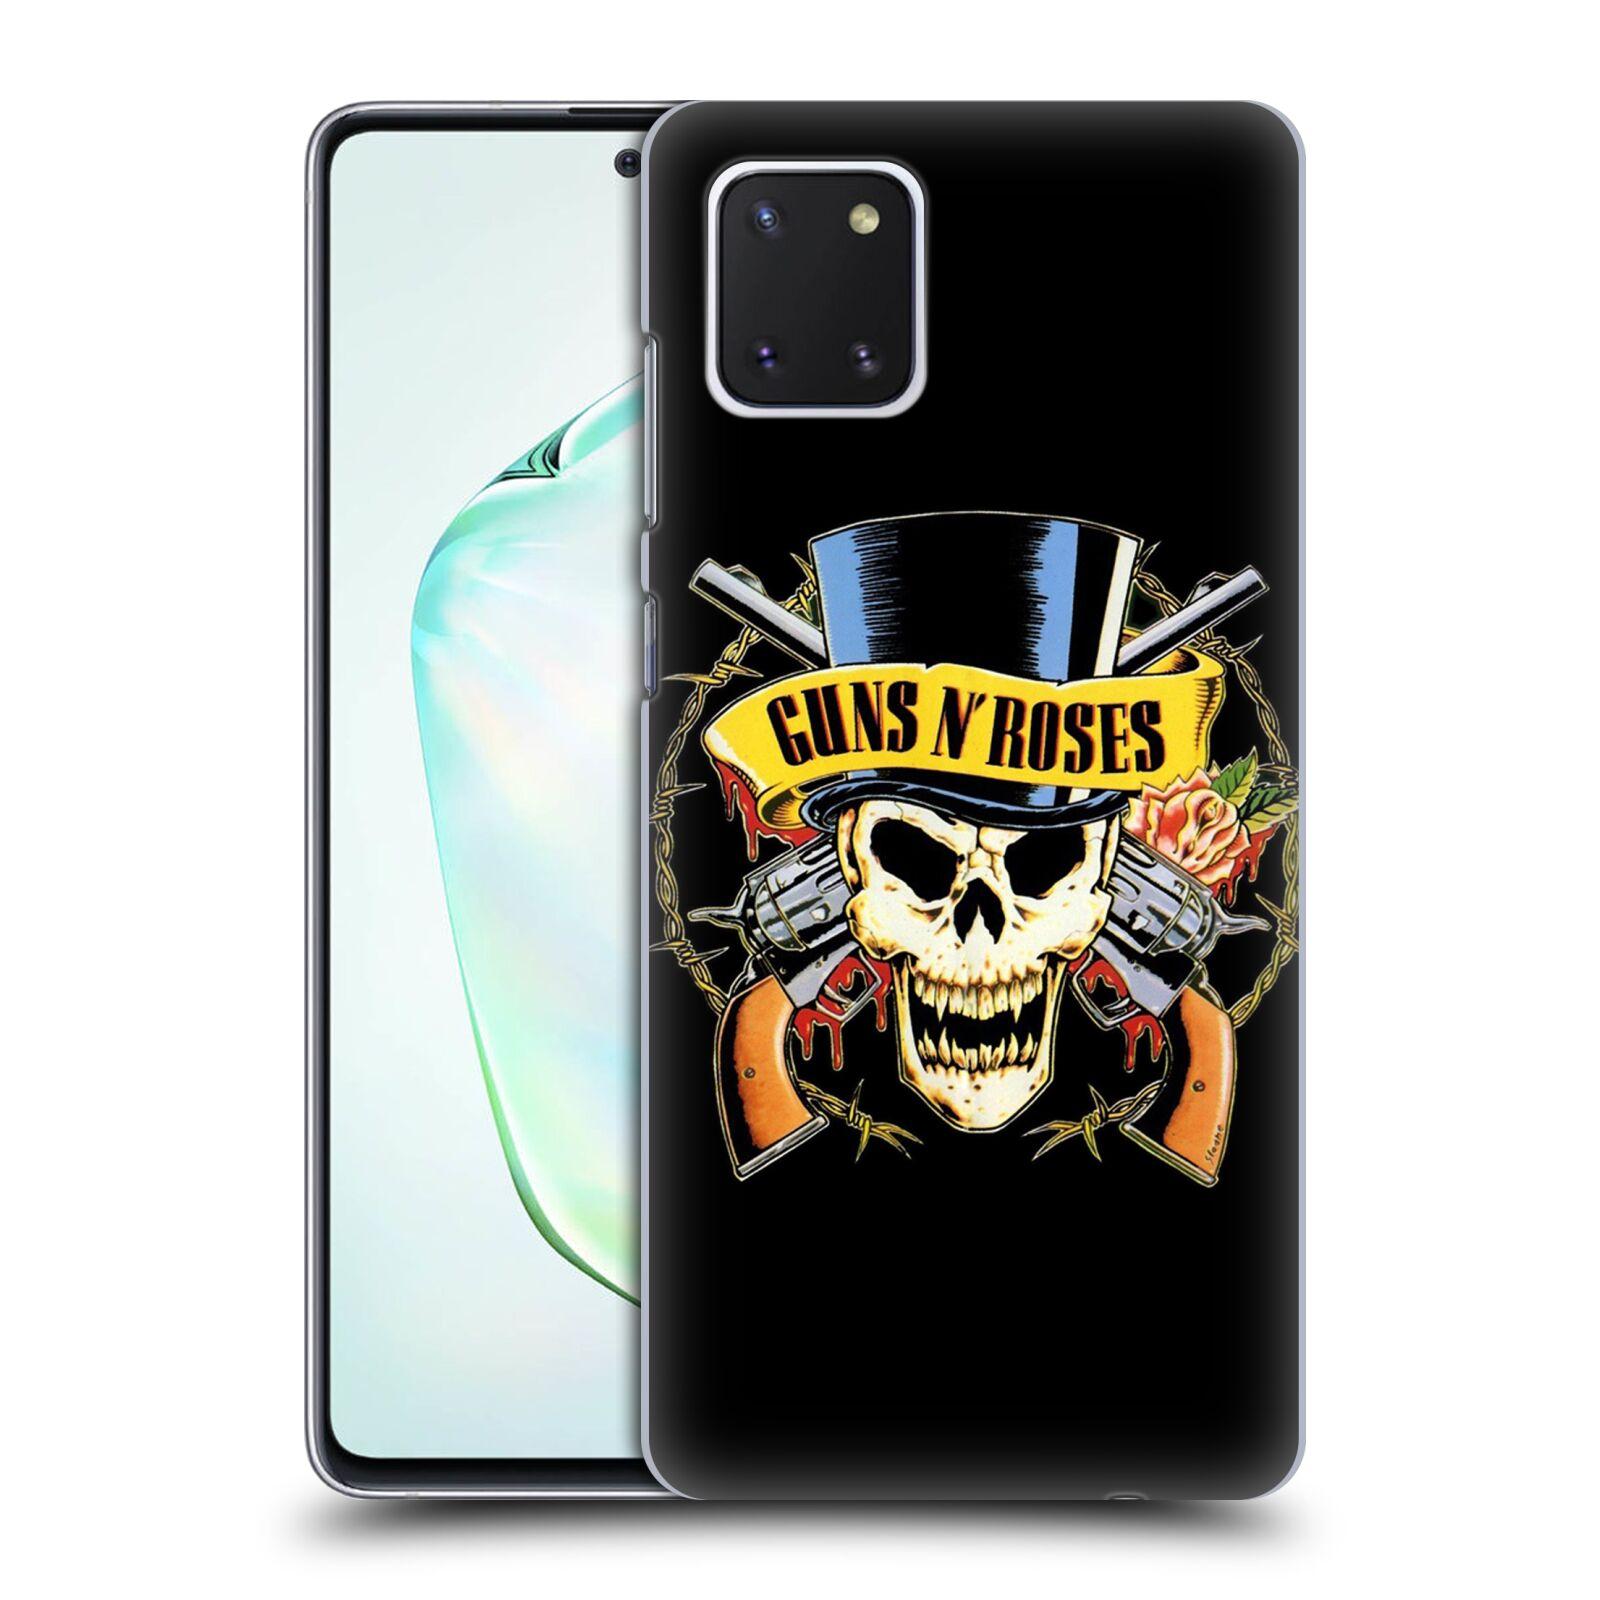 Plastové pouzdro na mobil Samsung Galaxy Note 10 Lite - Head Case - Guns N' Roses - Lebka